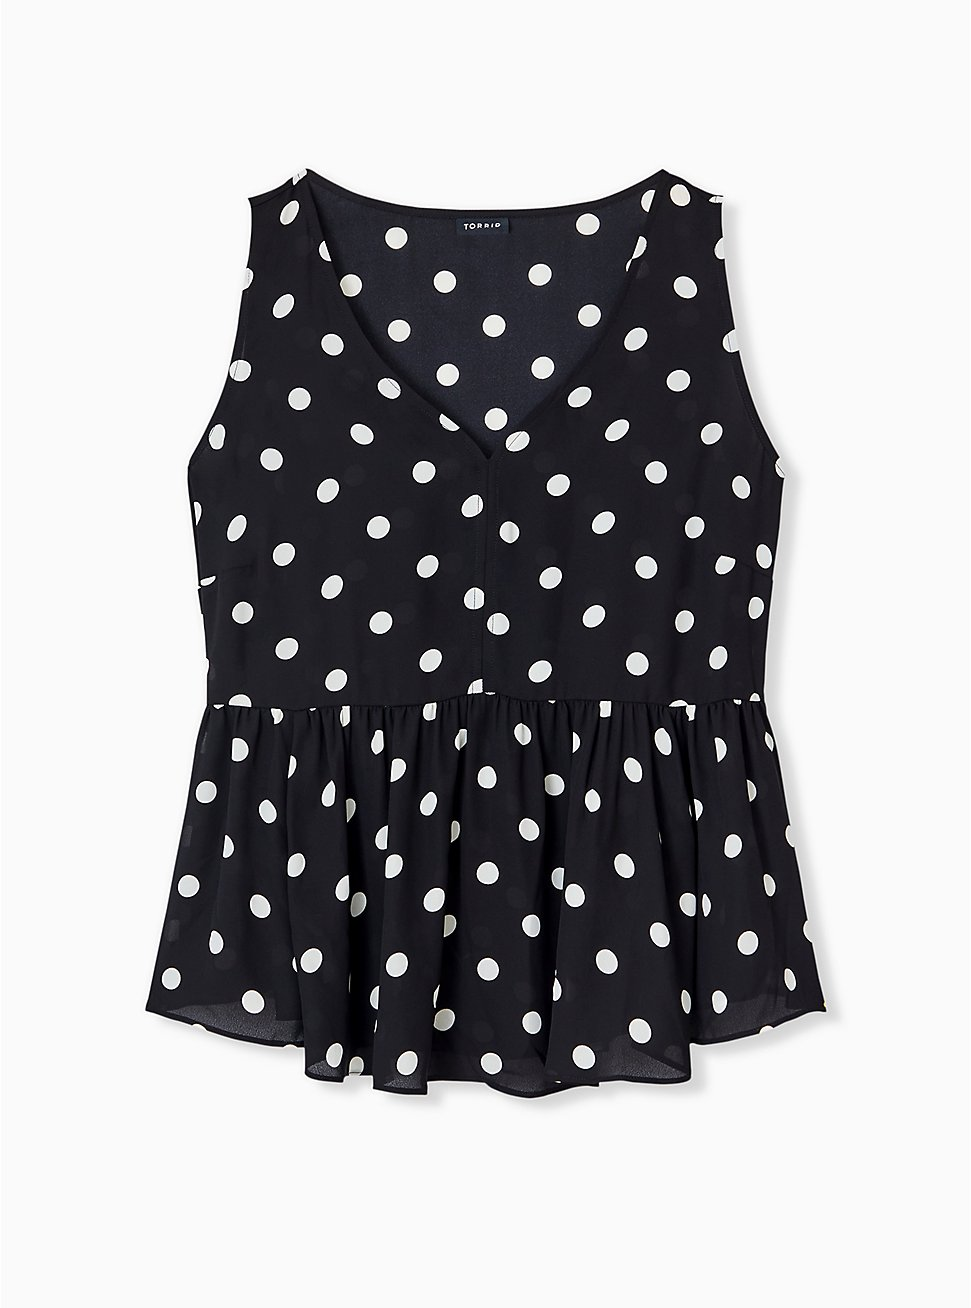 Black & White Polka Dot Georgette Peplum Sleeveless Blouse, MULTI, hi-res